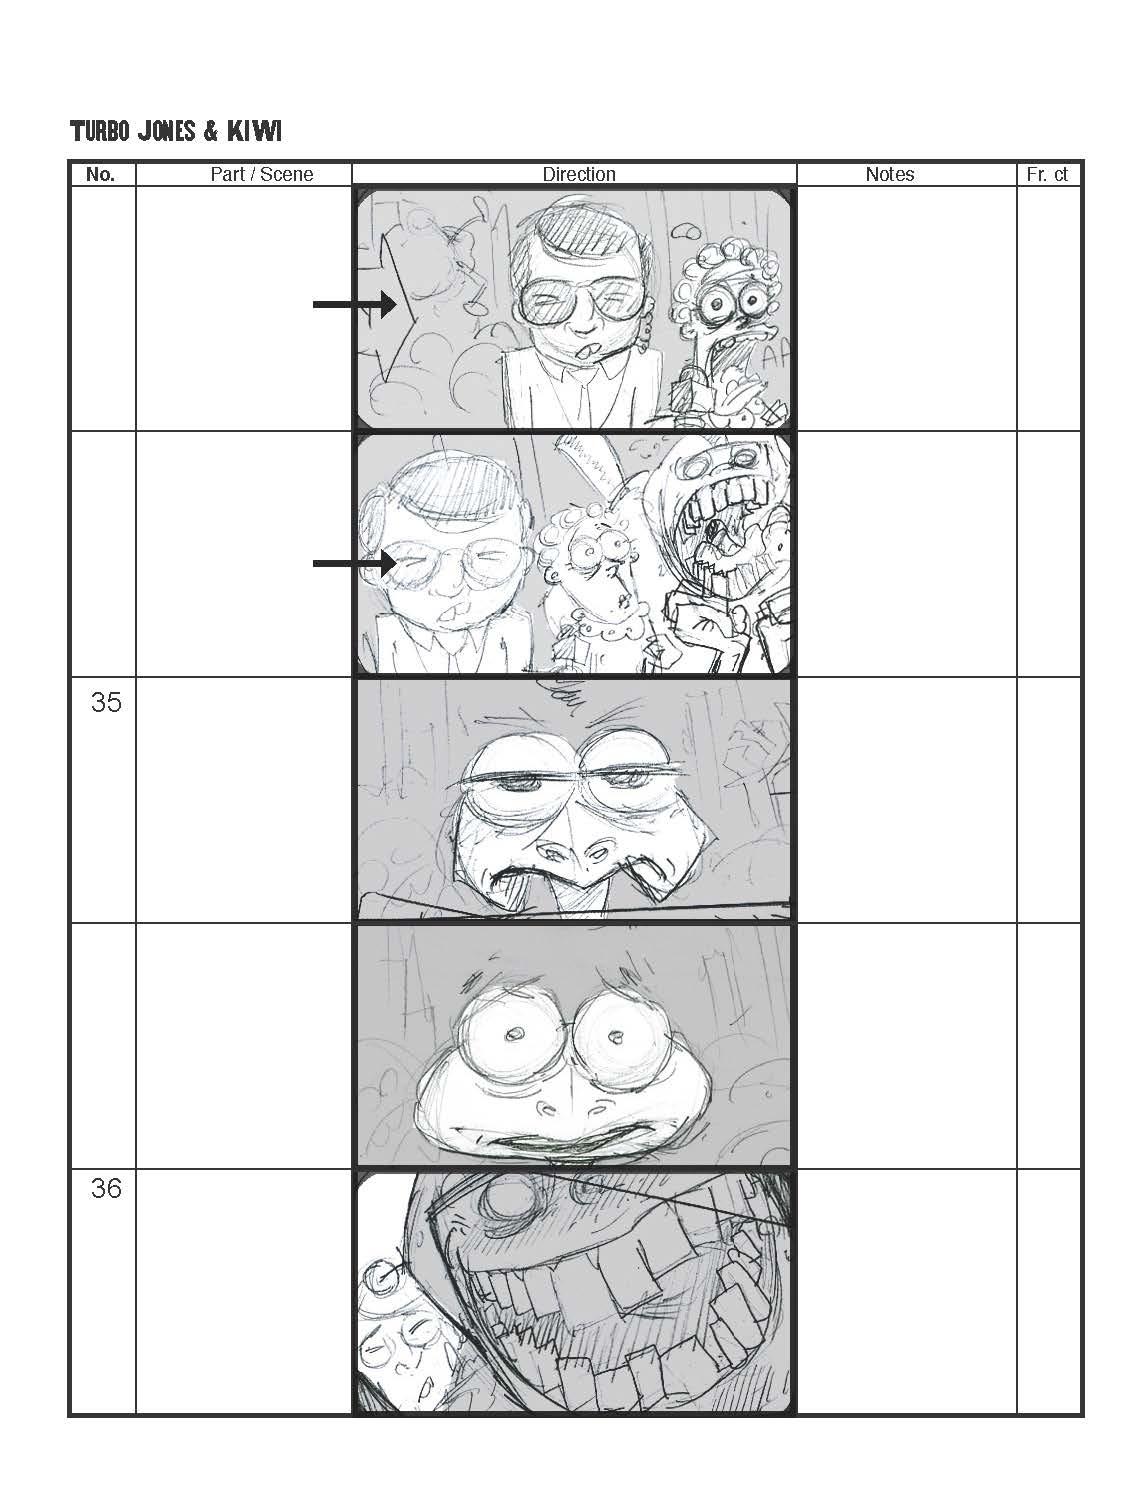 TJK_Storyboards_v01_HIGH_Page_19.jpg